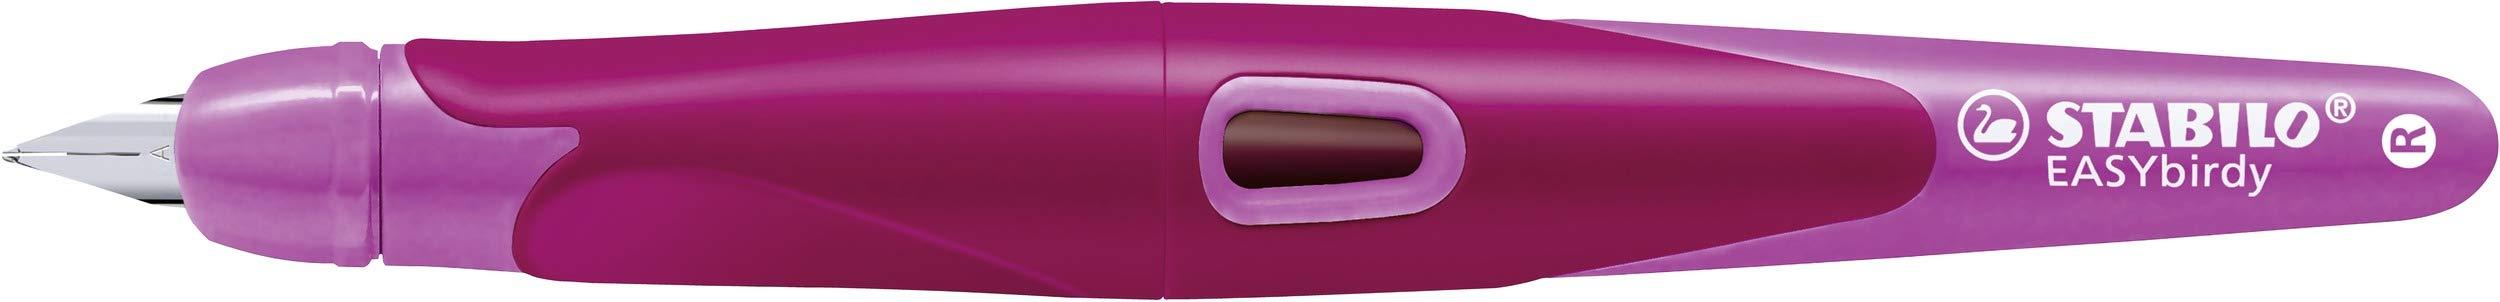 Blister STABILO EASYbirdy Penna Stilografica Ergonomica Rosa//Magenta per Destrimani